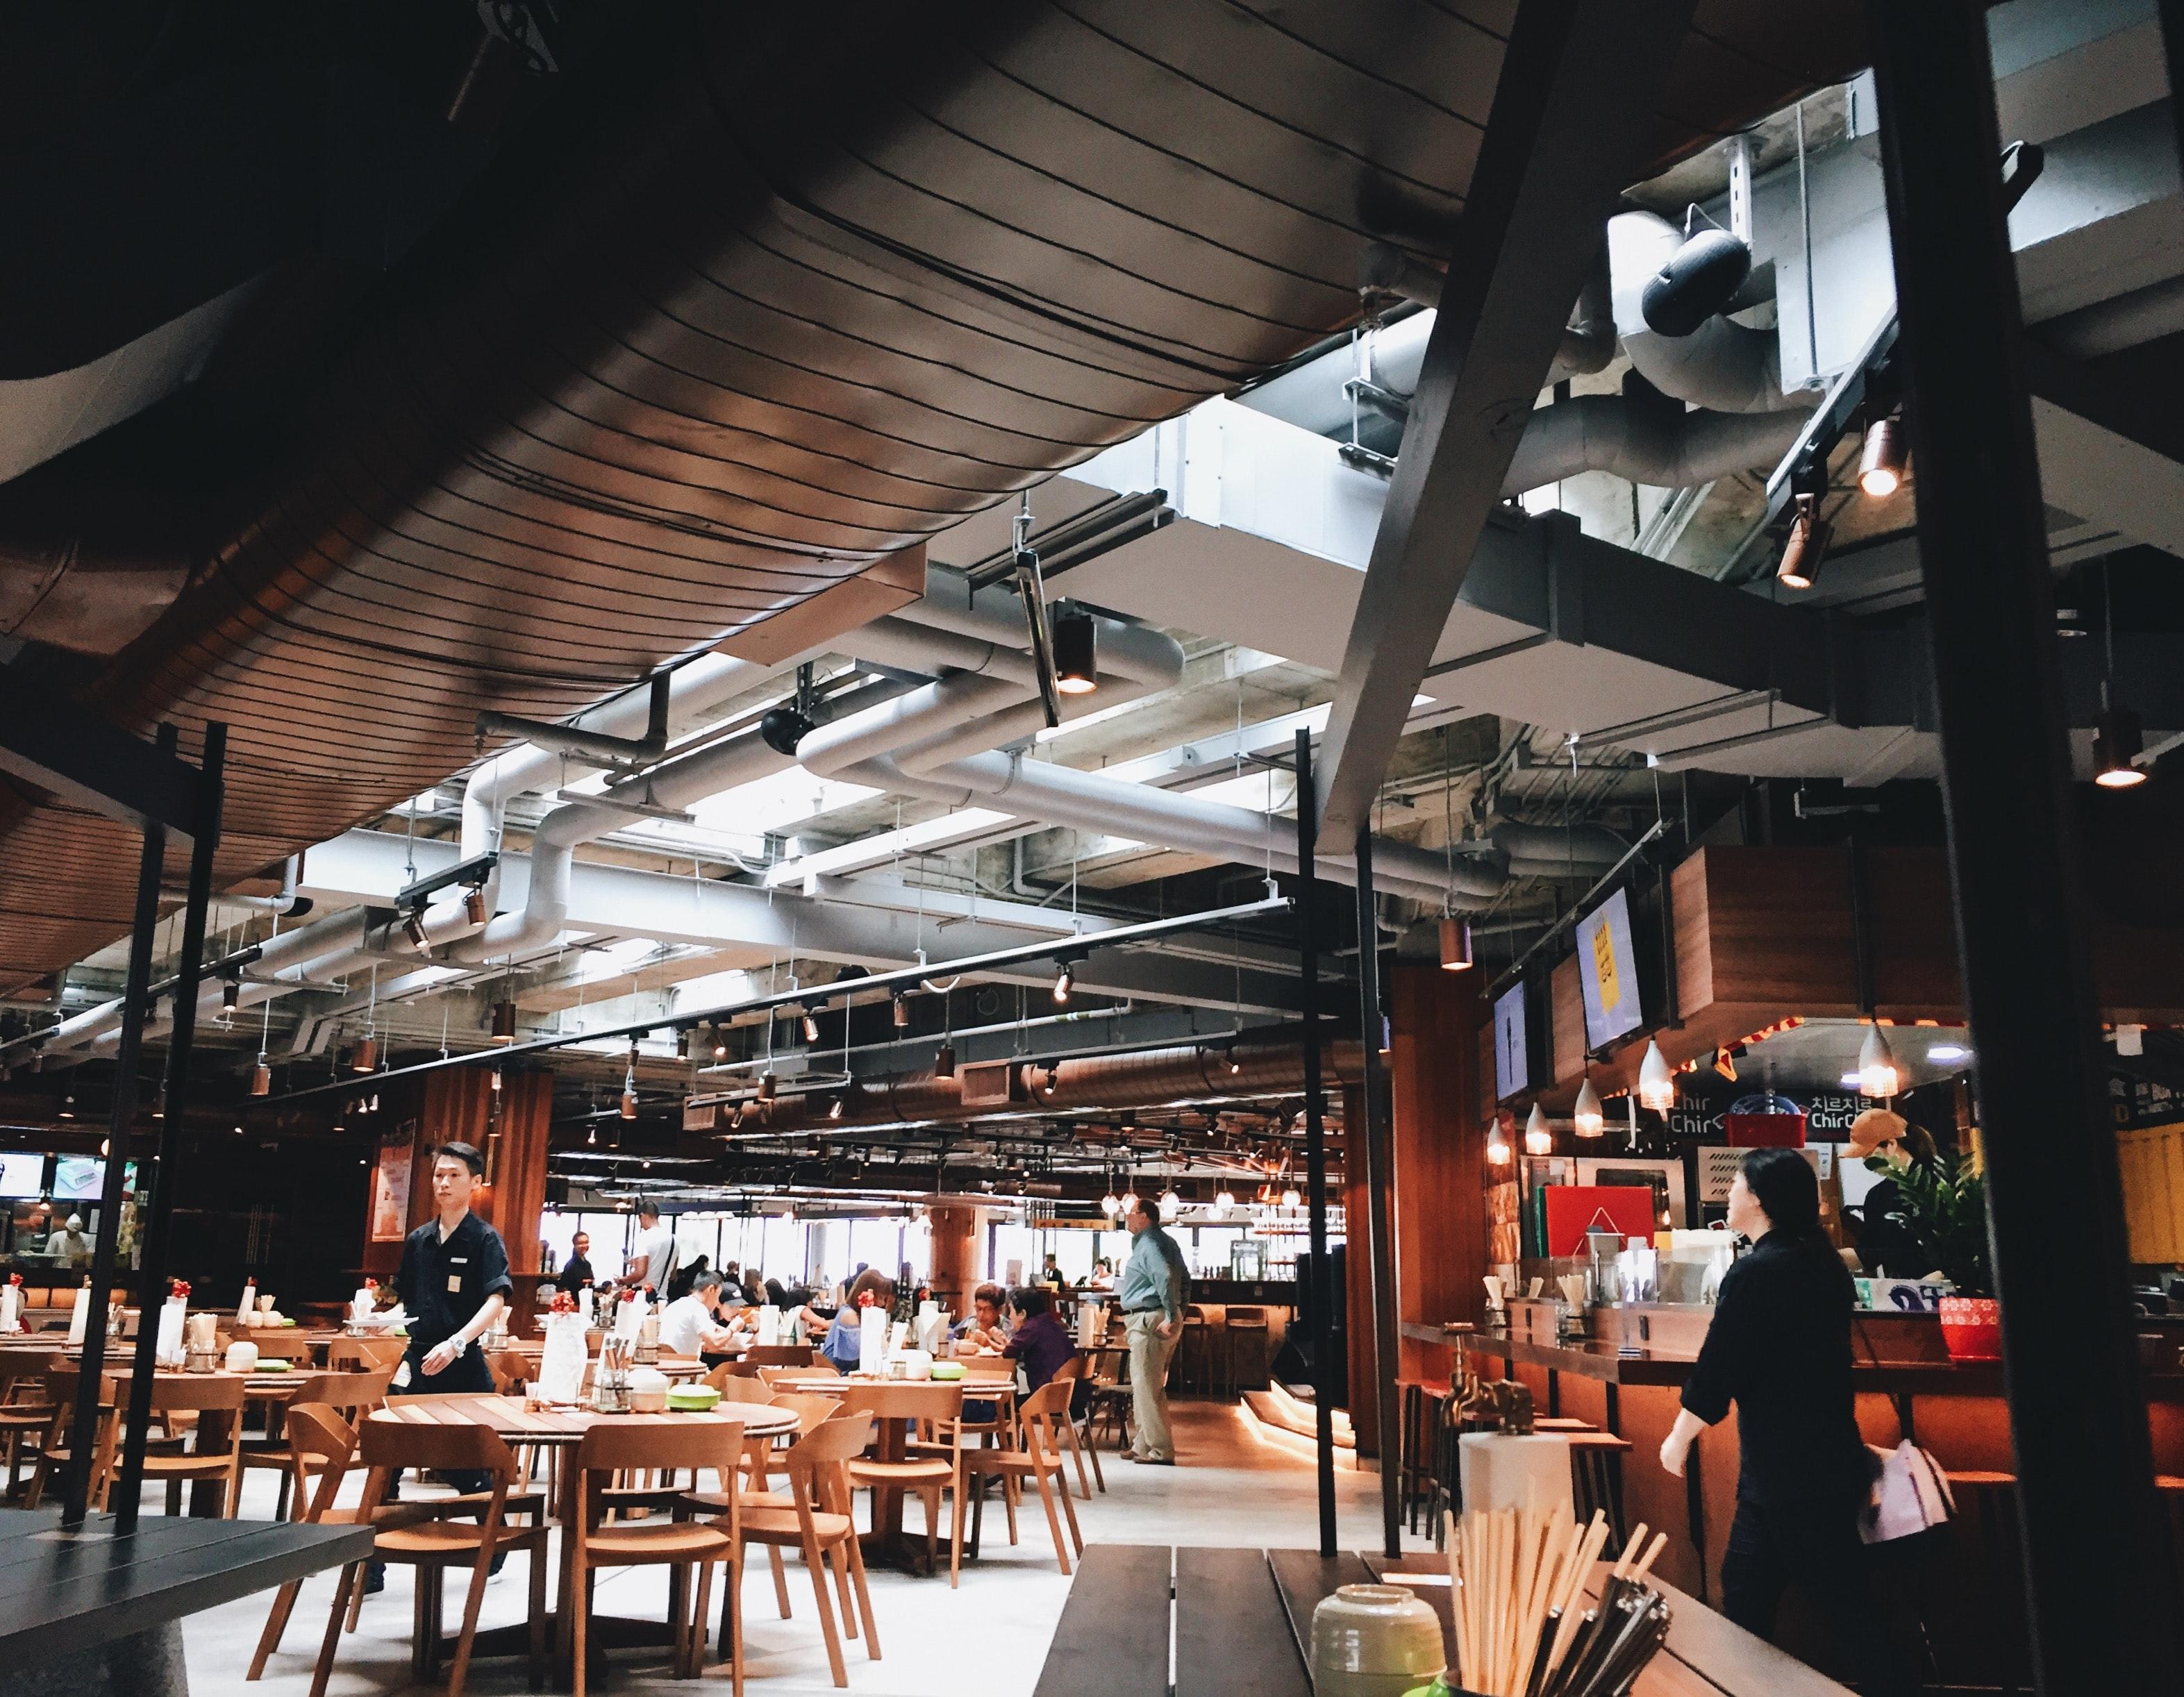 Stork Restaurant, 10 Best Restaurants In Amsterdam To Visit For Great Food